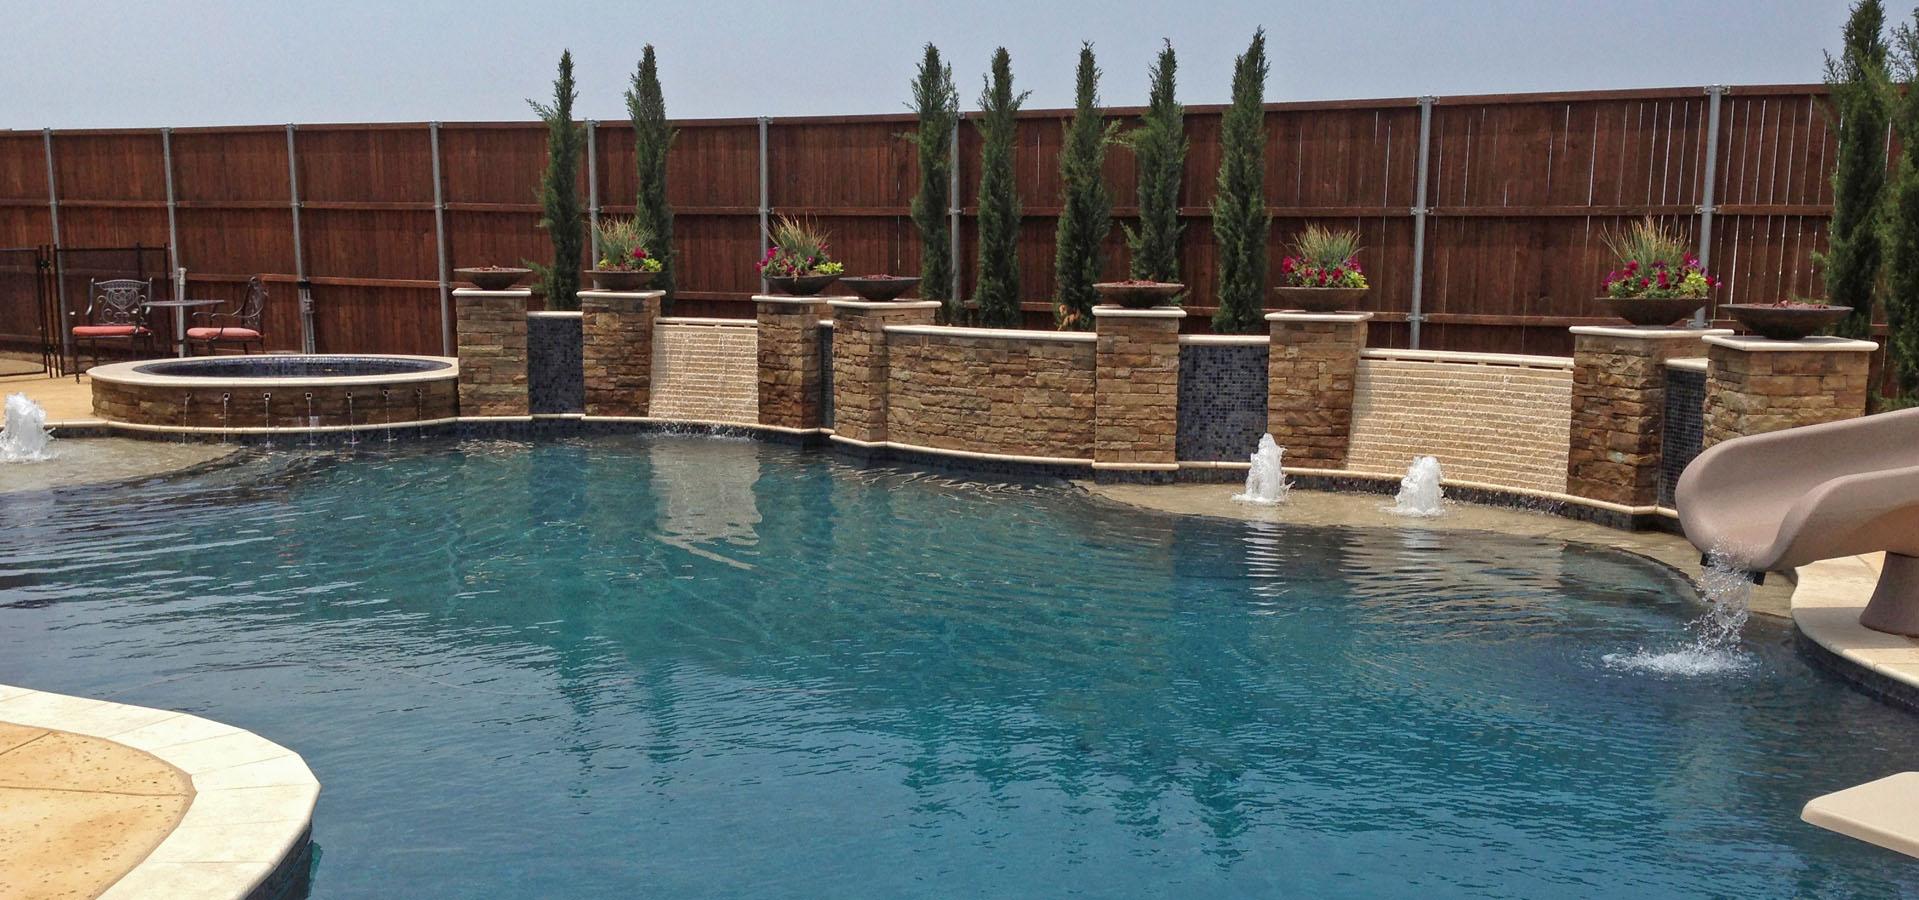 Dallas custom pools frisco pool builder in dallas for Custom pool builder